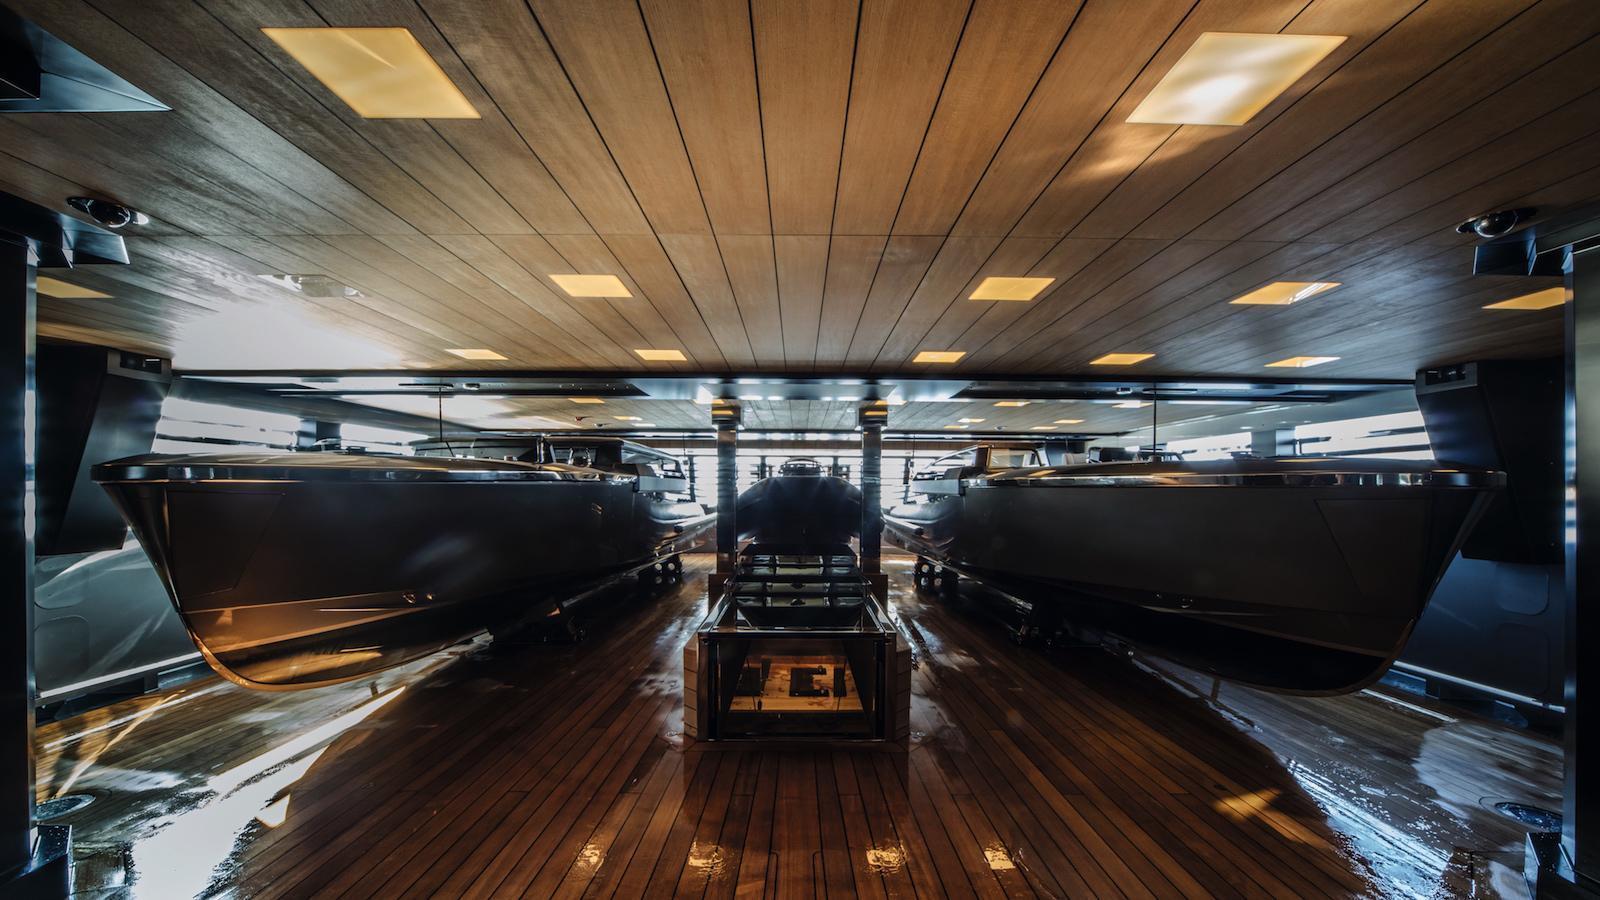 Atlante-motor-yacht-crn-2015-55m-tender-garage